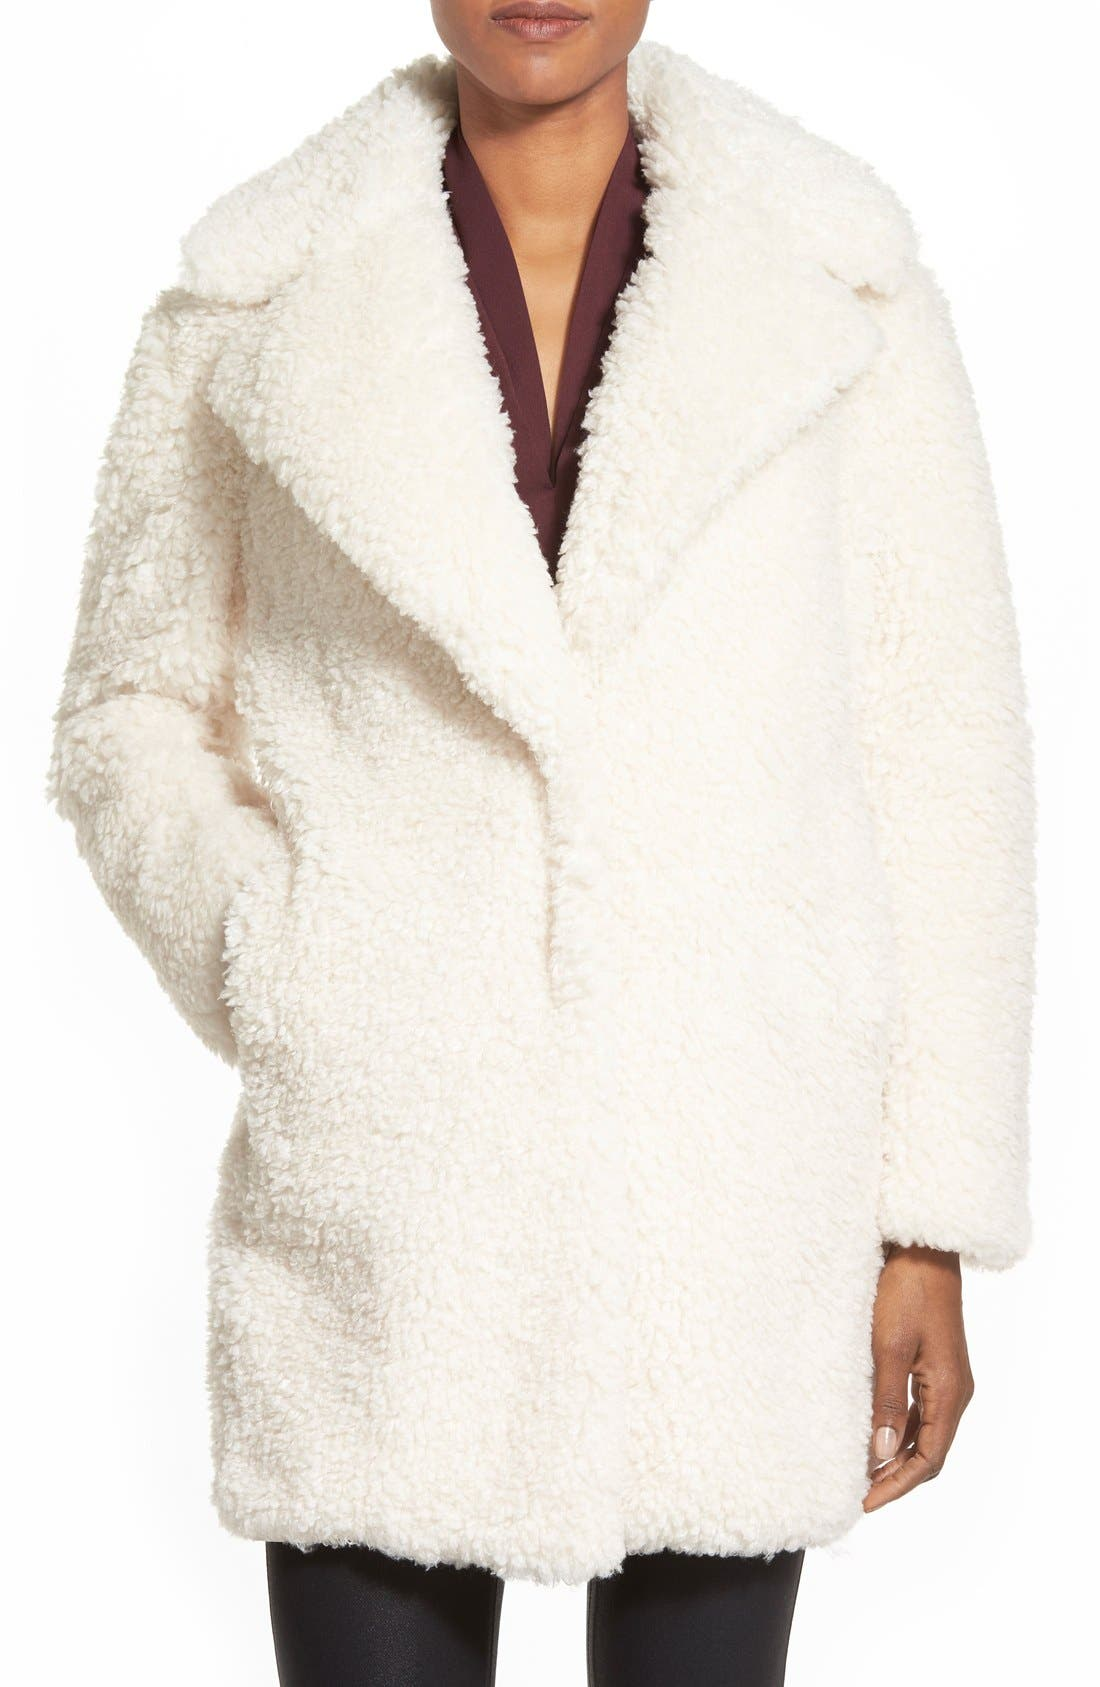 Main Image - kensie 'Teddy Bear' Notch Collar Reversible Faux Fur Coat (Online Only)